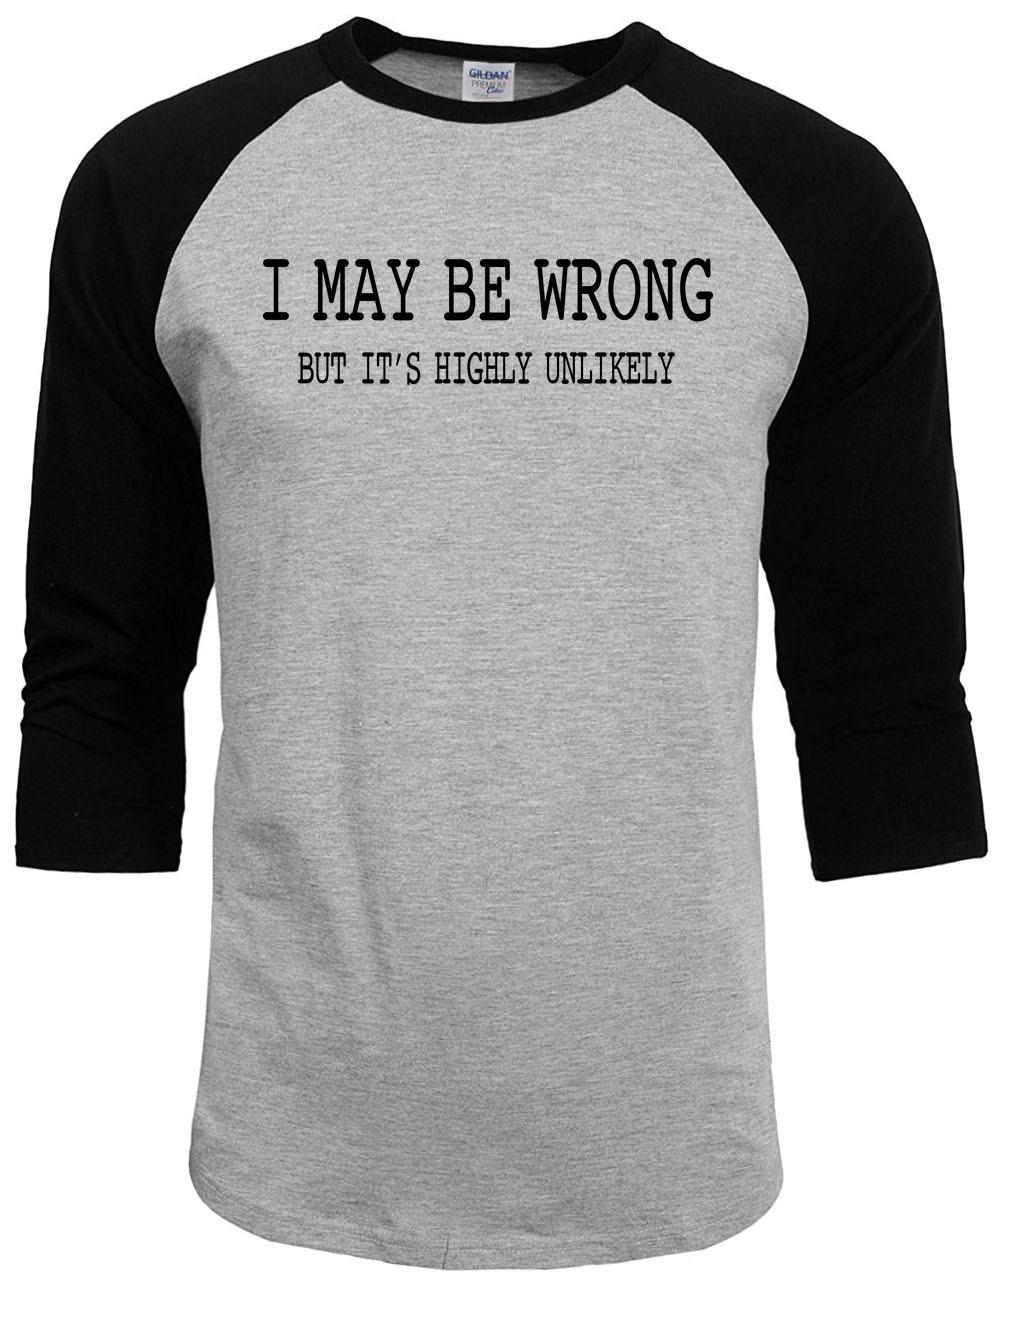 2017 new fashion t shirts Mens Funny Sayings Slogans T Shirts I ...